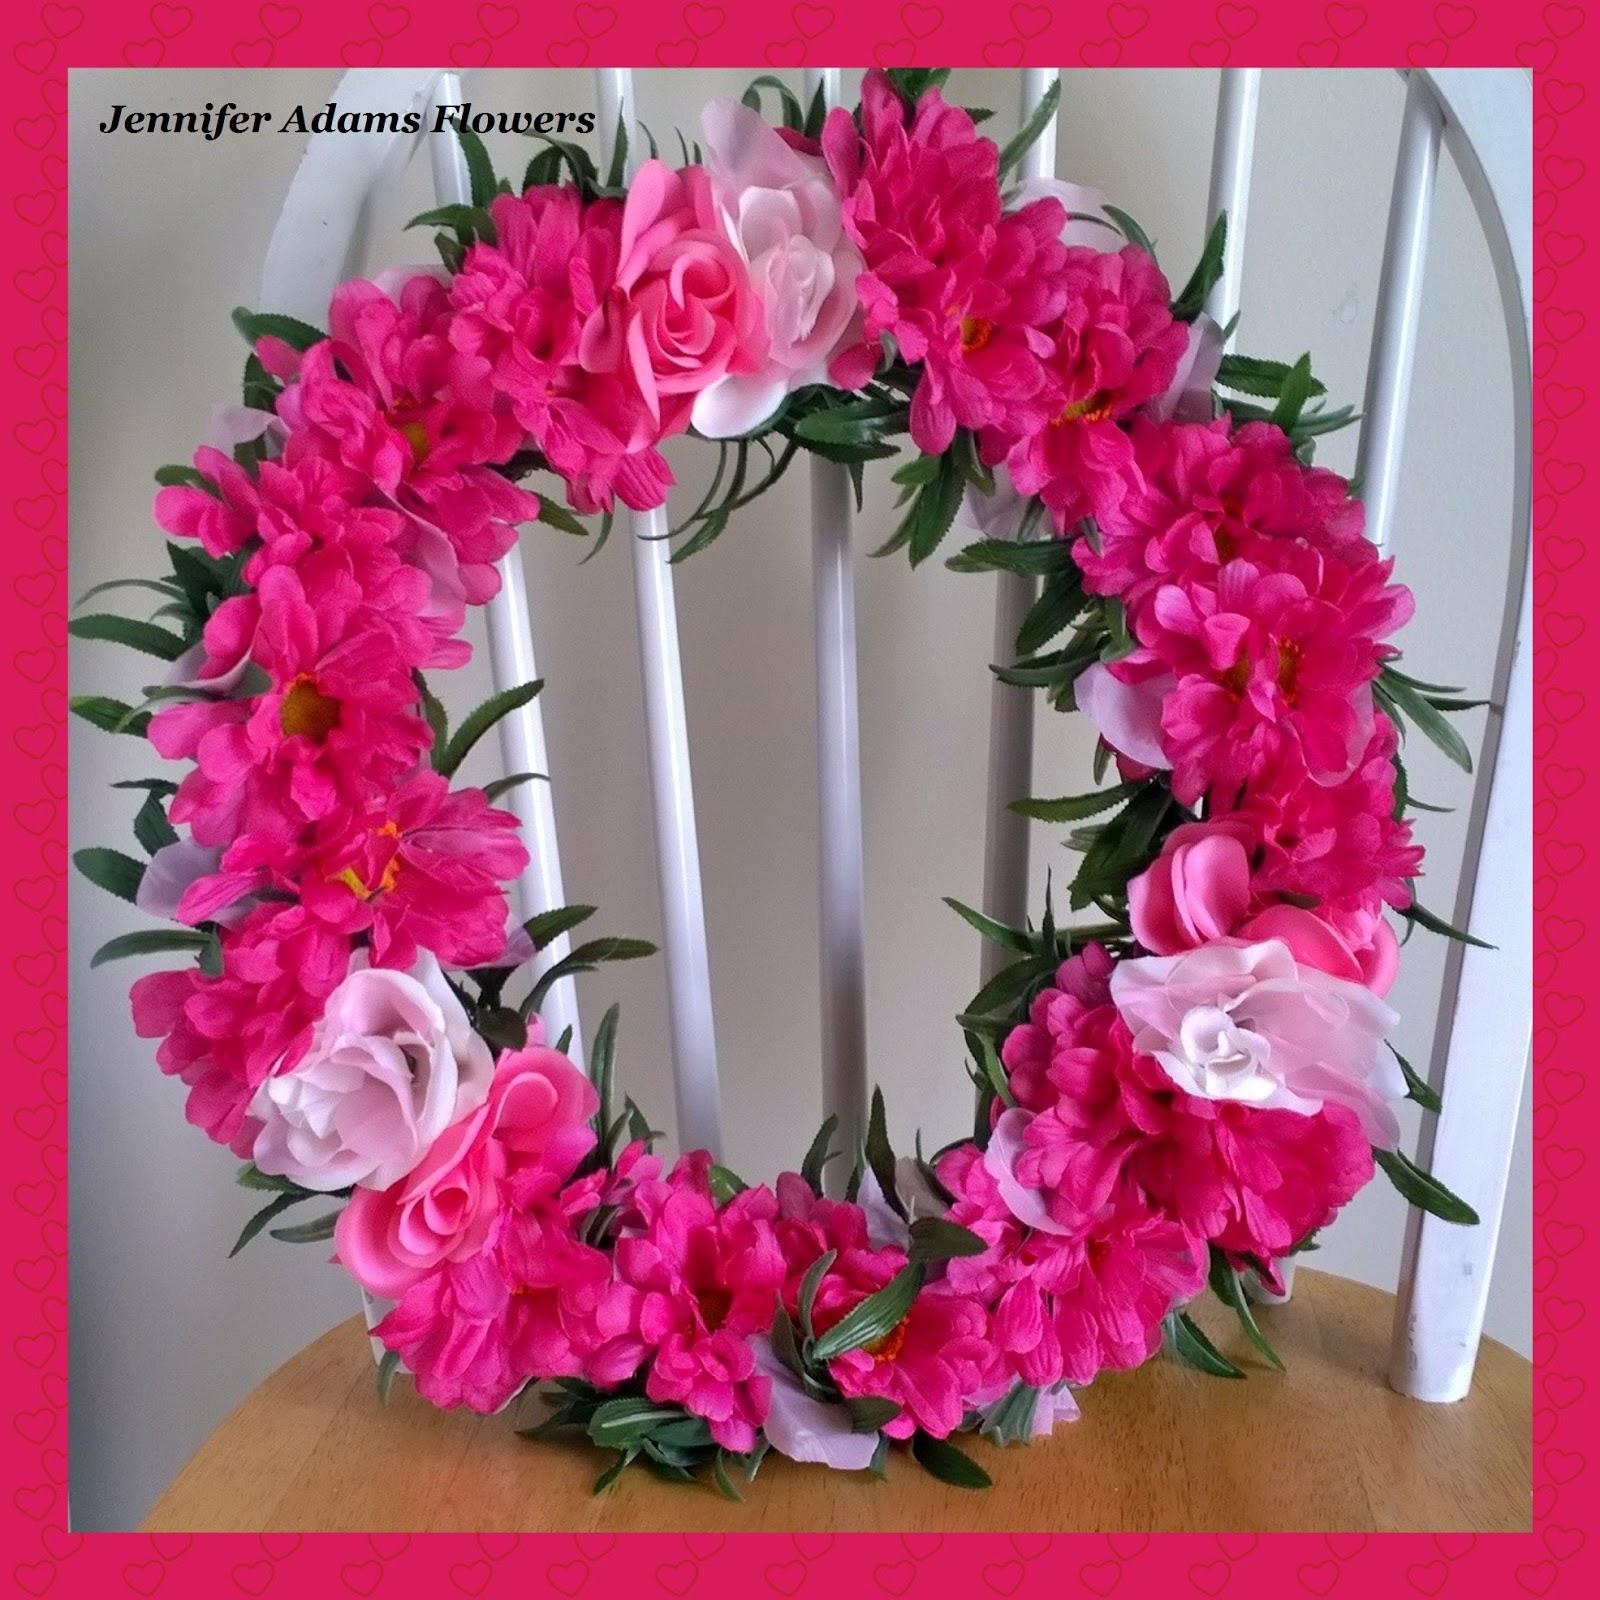 Jennifer Adams Flowers Upcycle Party Decor Turned Keepsake Wreath